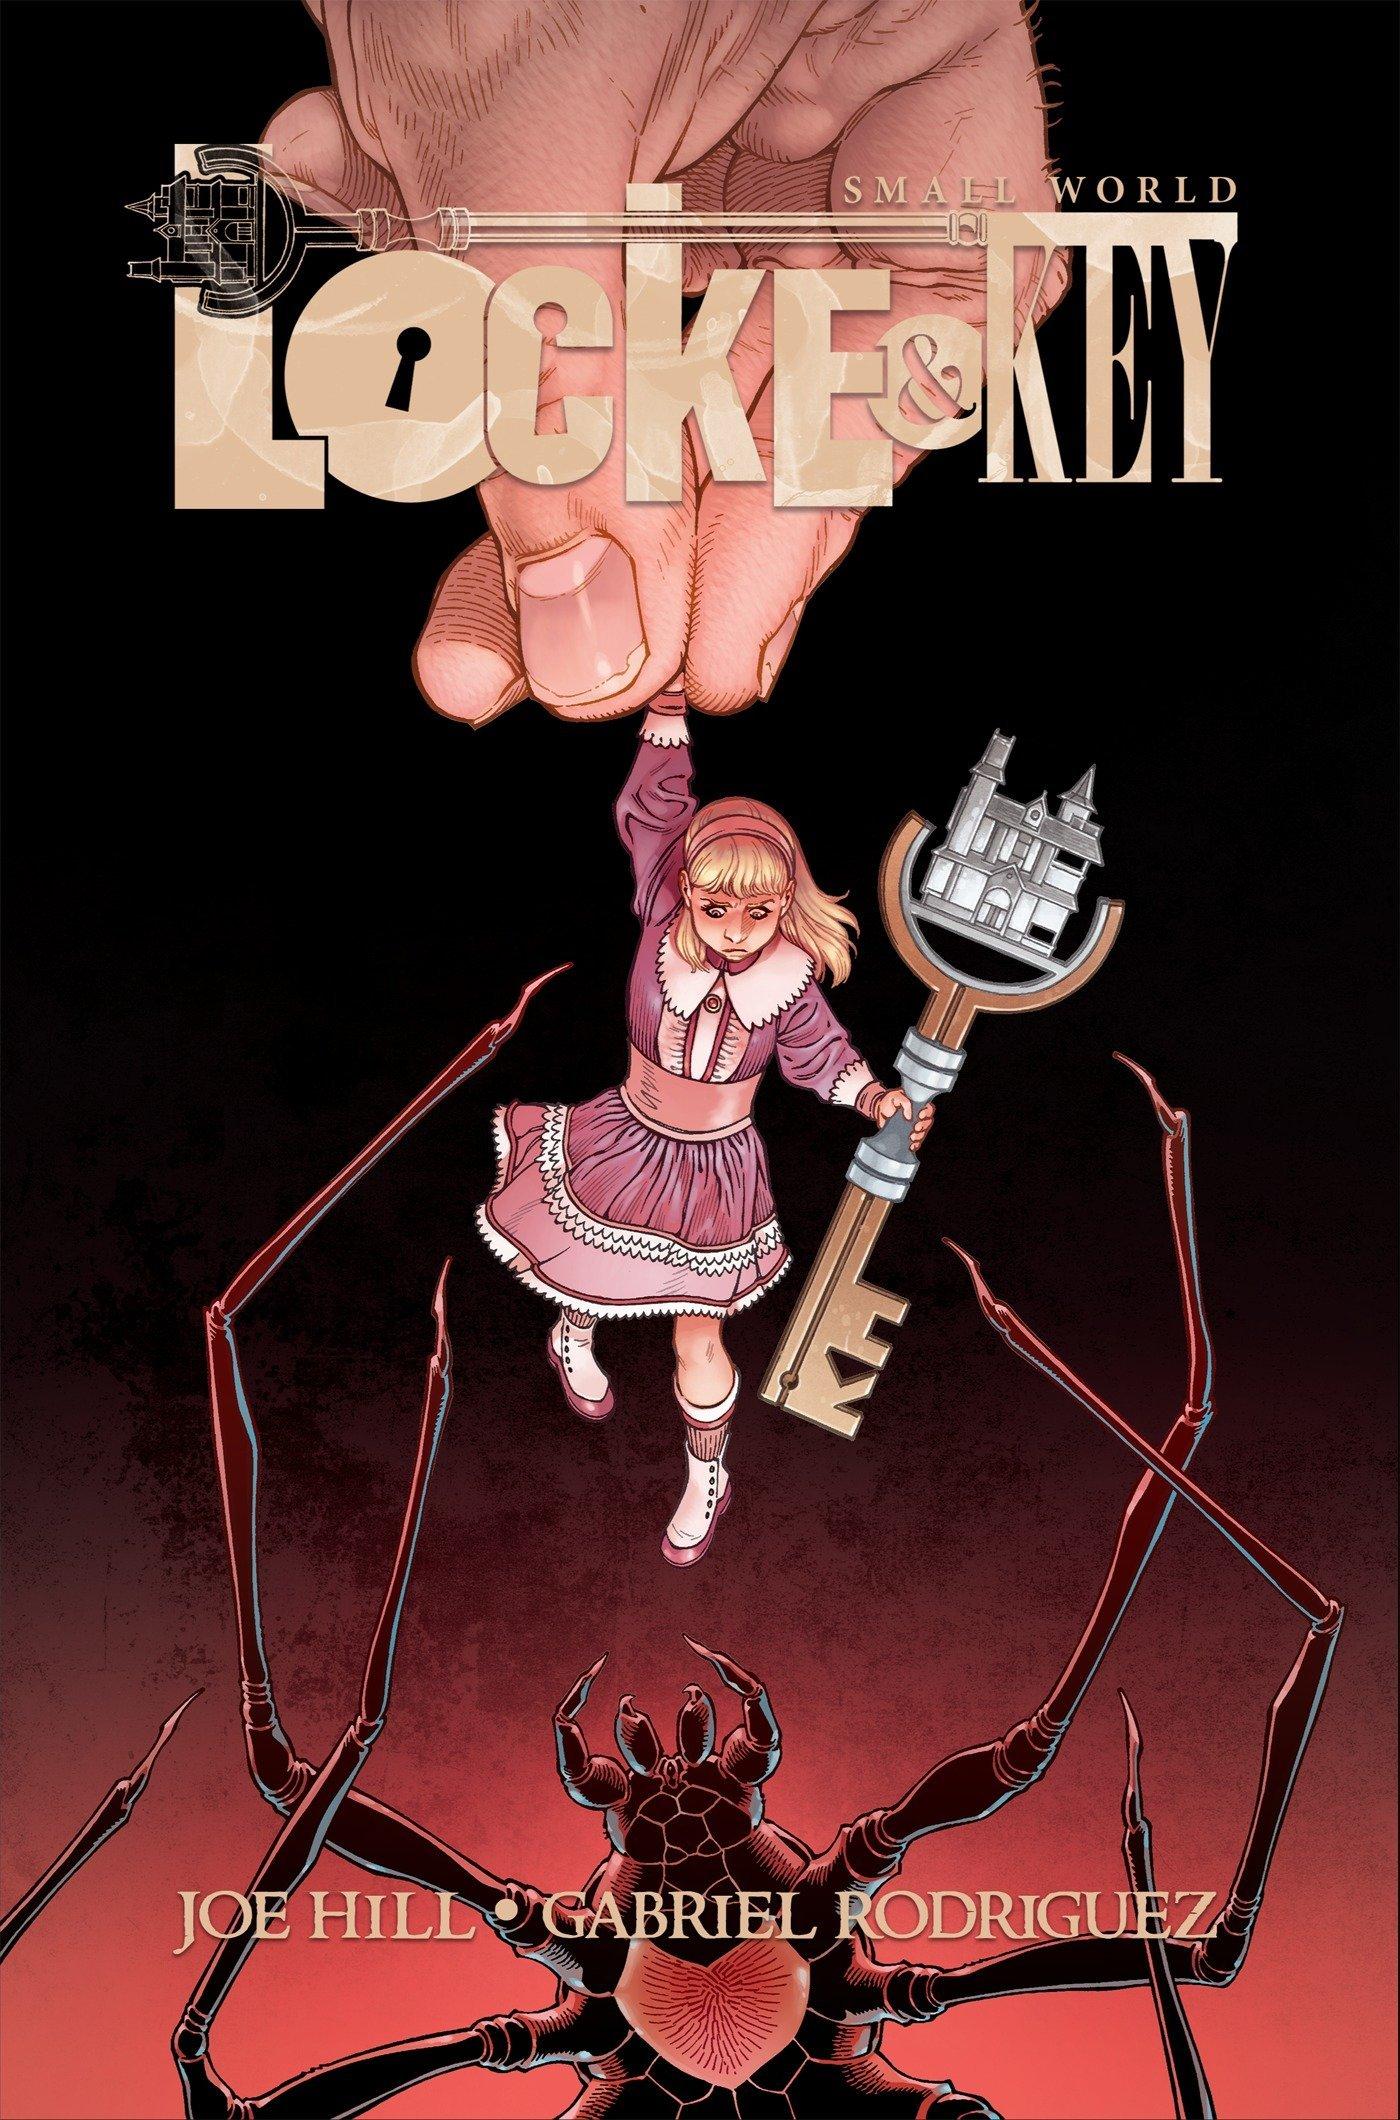 Resenha: Locke&Key -